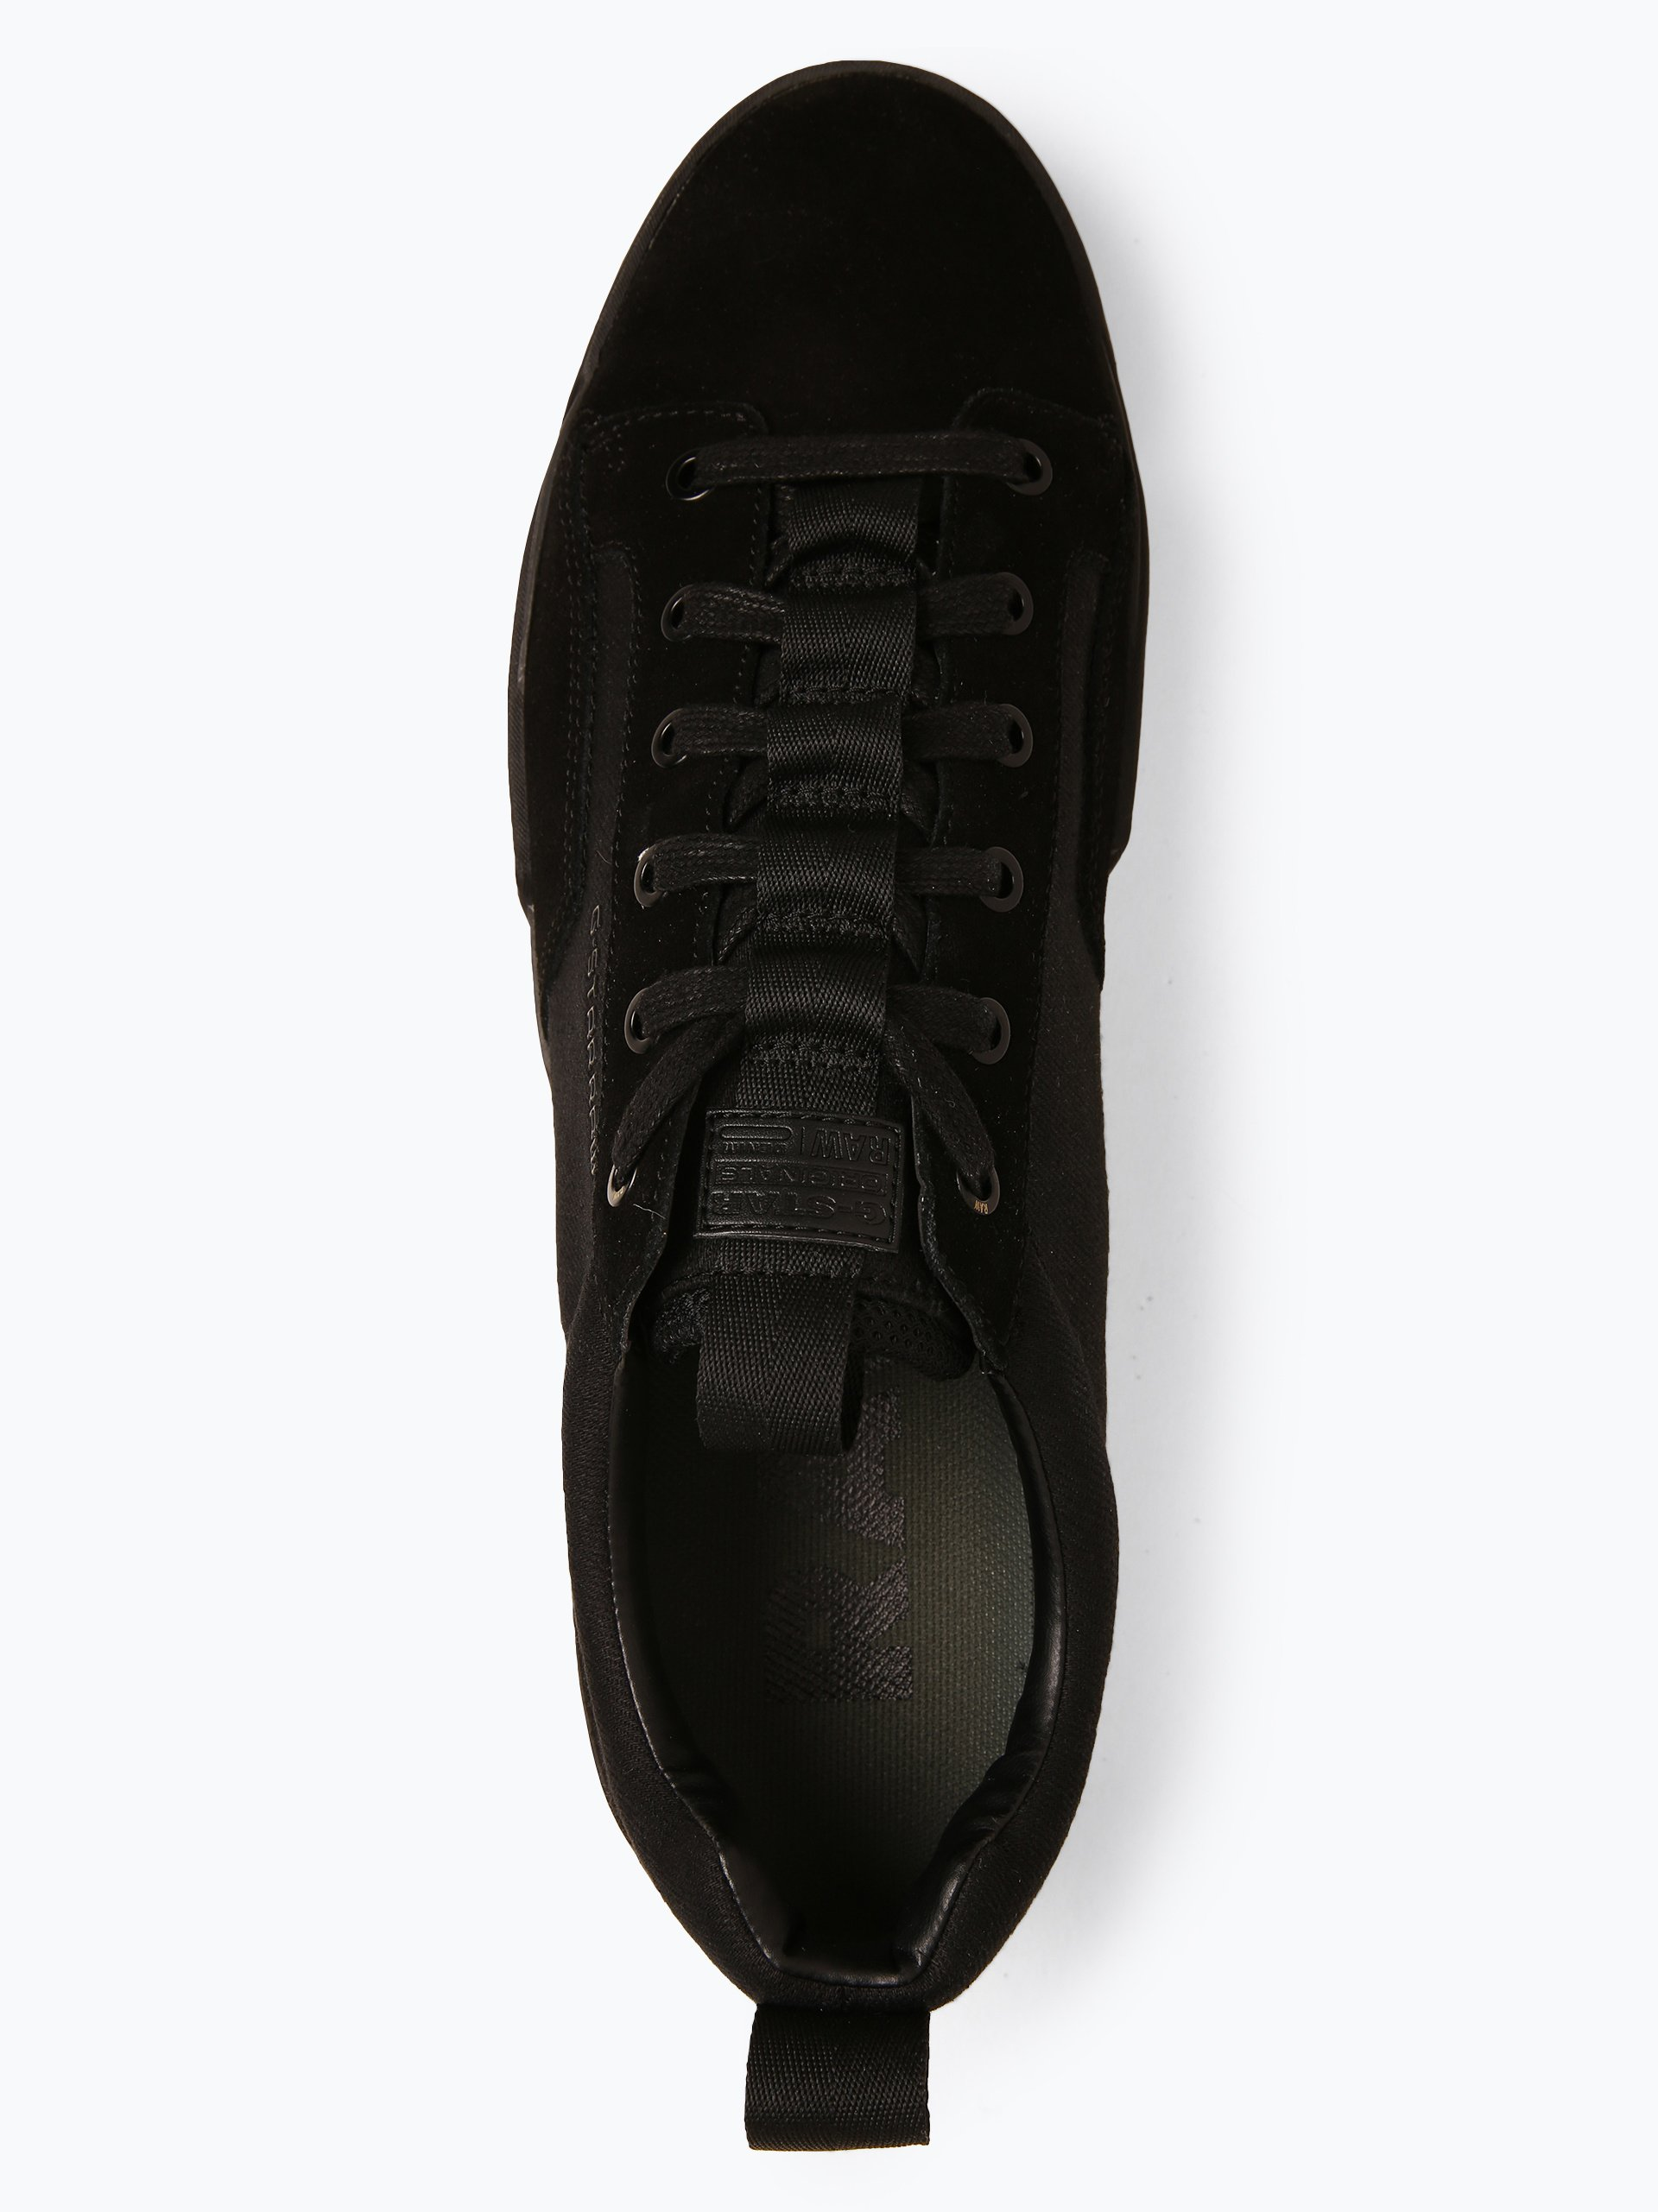 G-Star RAW Herren Sneaker mit Leder-Anteil - Rackam